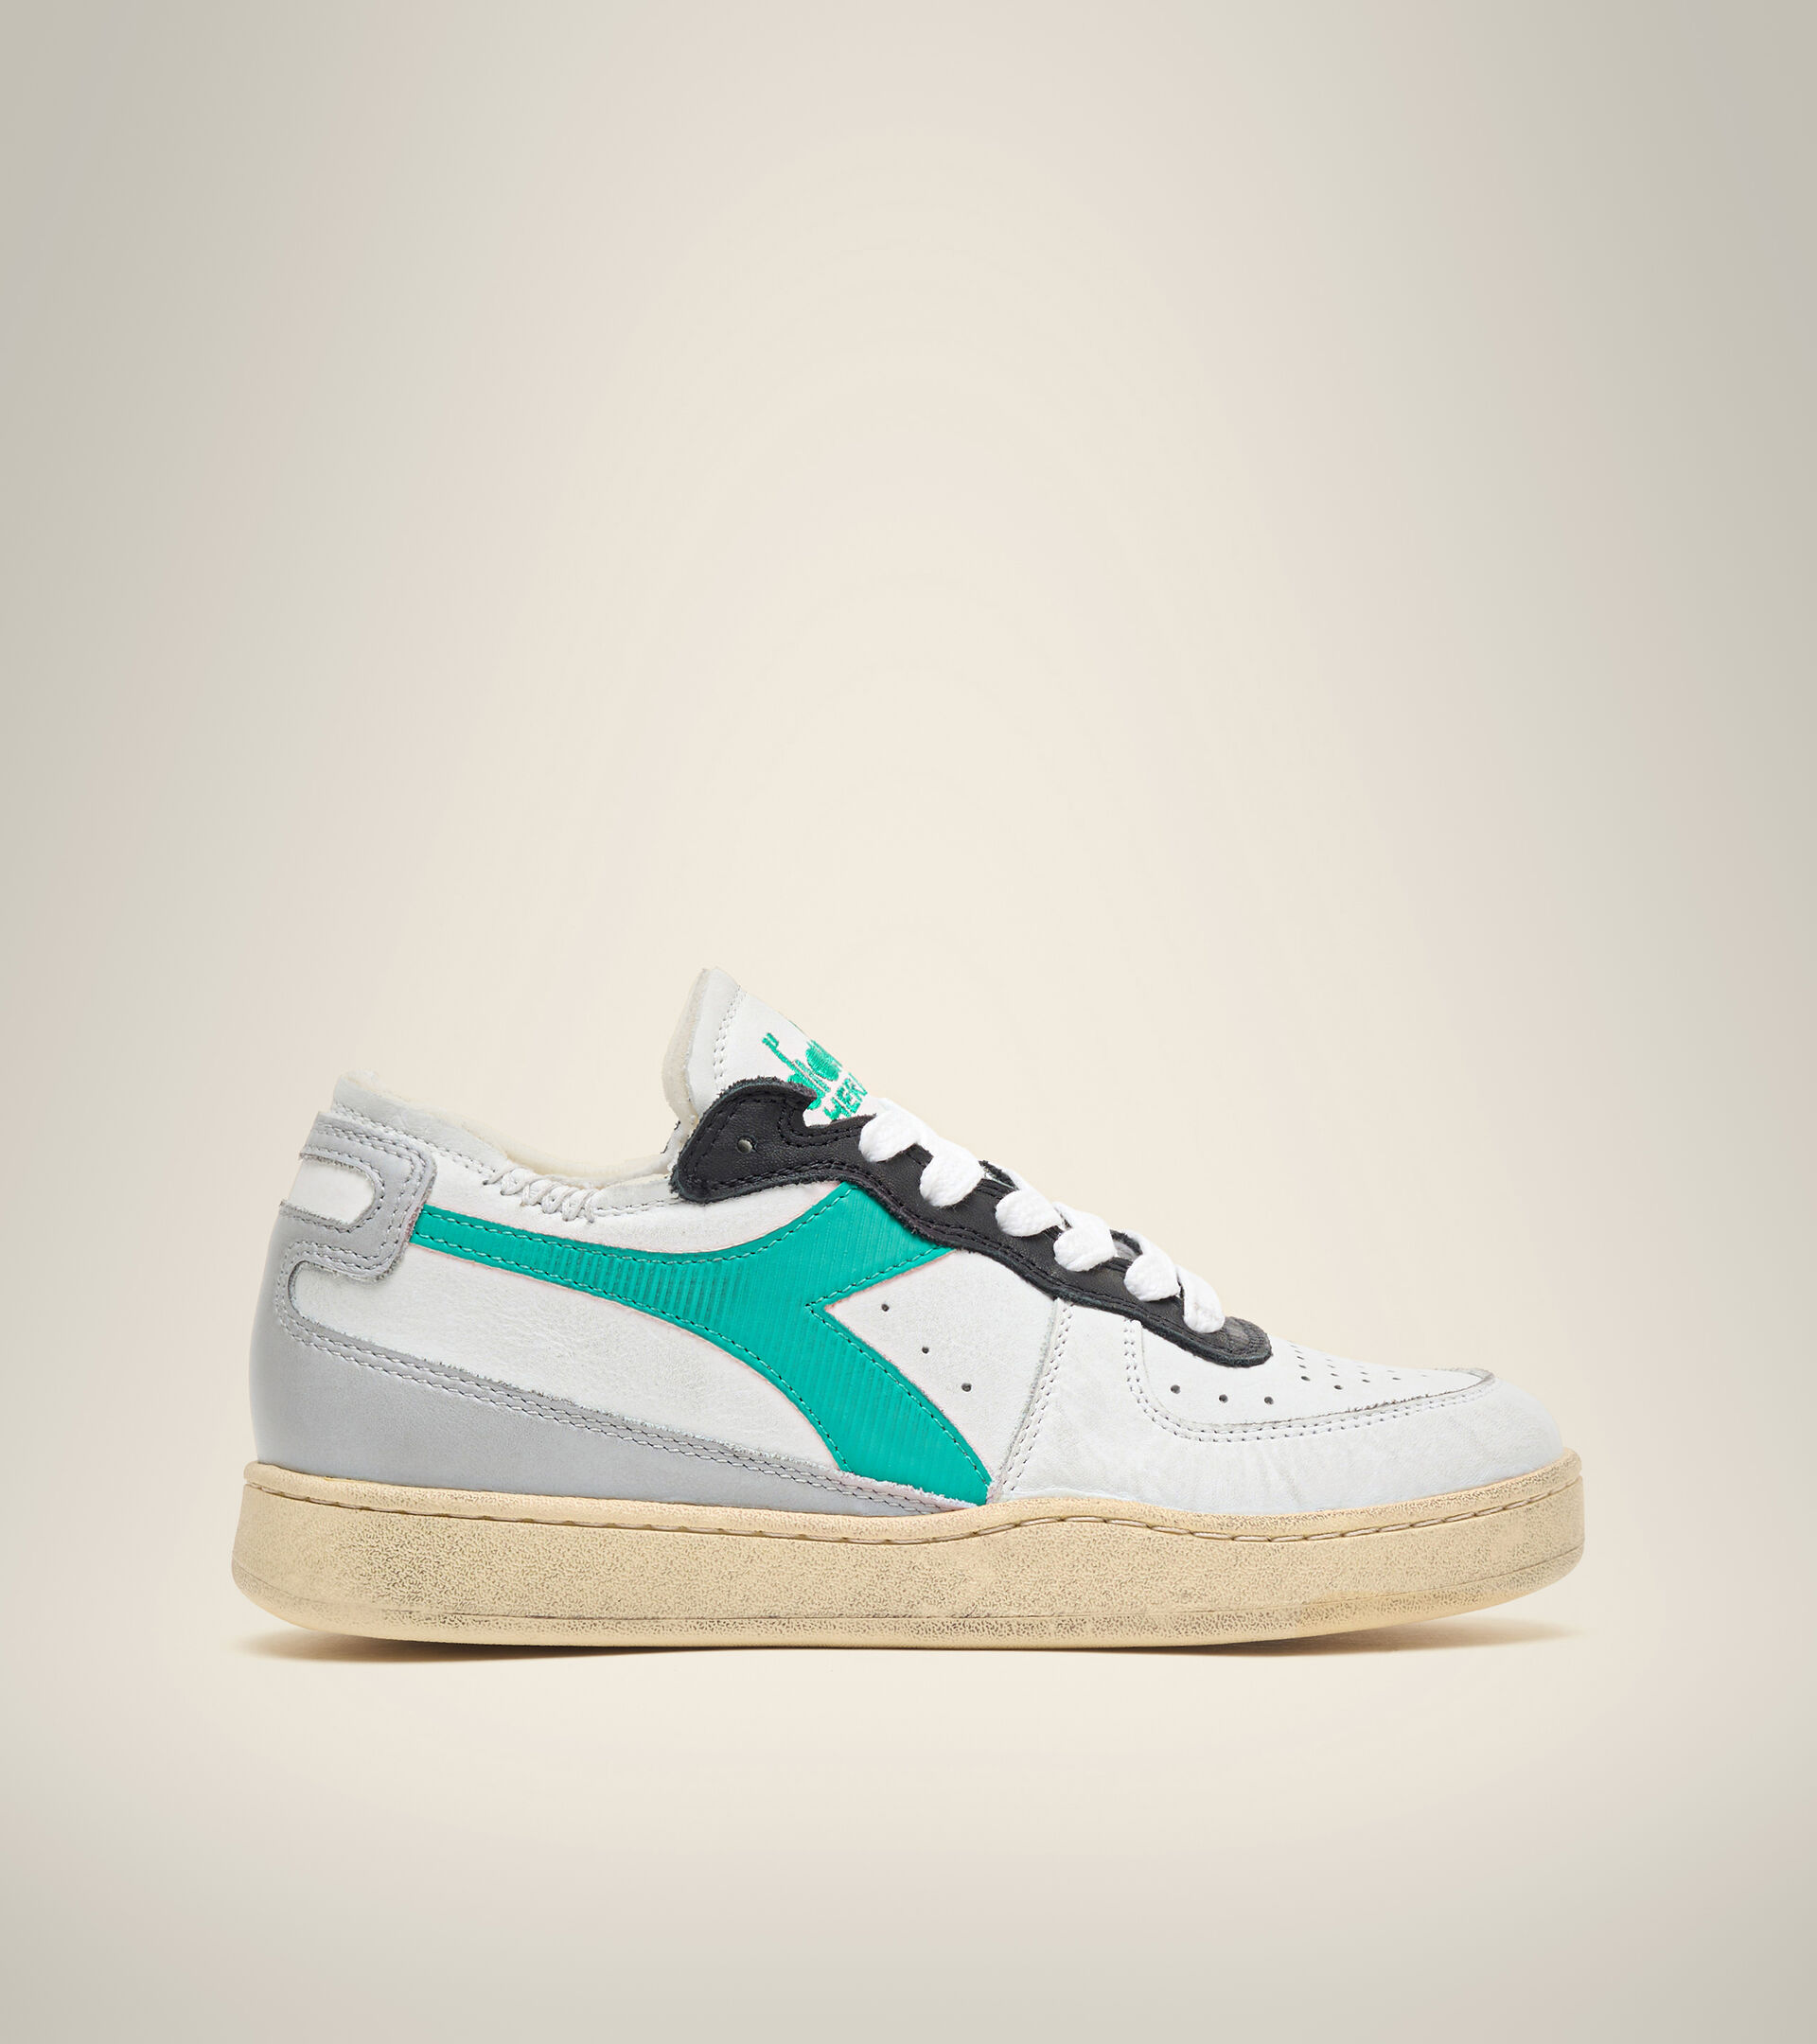 Footwear Heritage UNISEX MI BASKET ROW CUT BCO/GR GRATTACIELO/VRD CODA PA Diadora